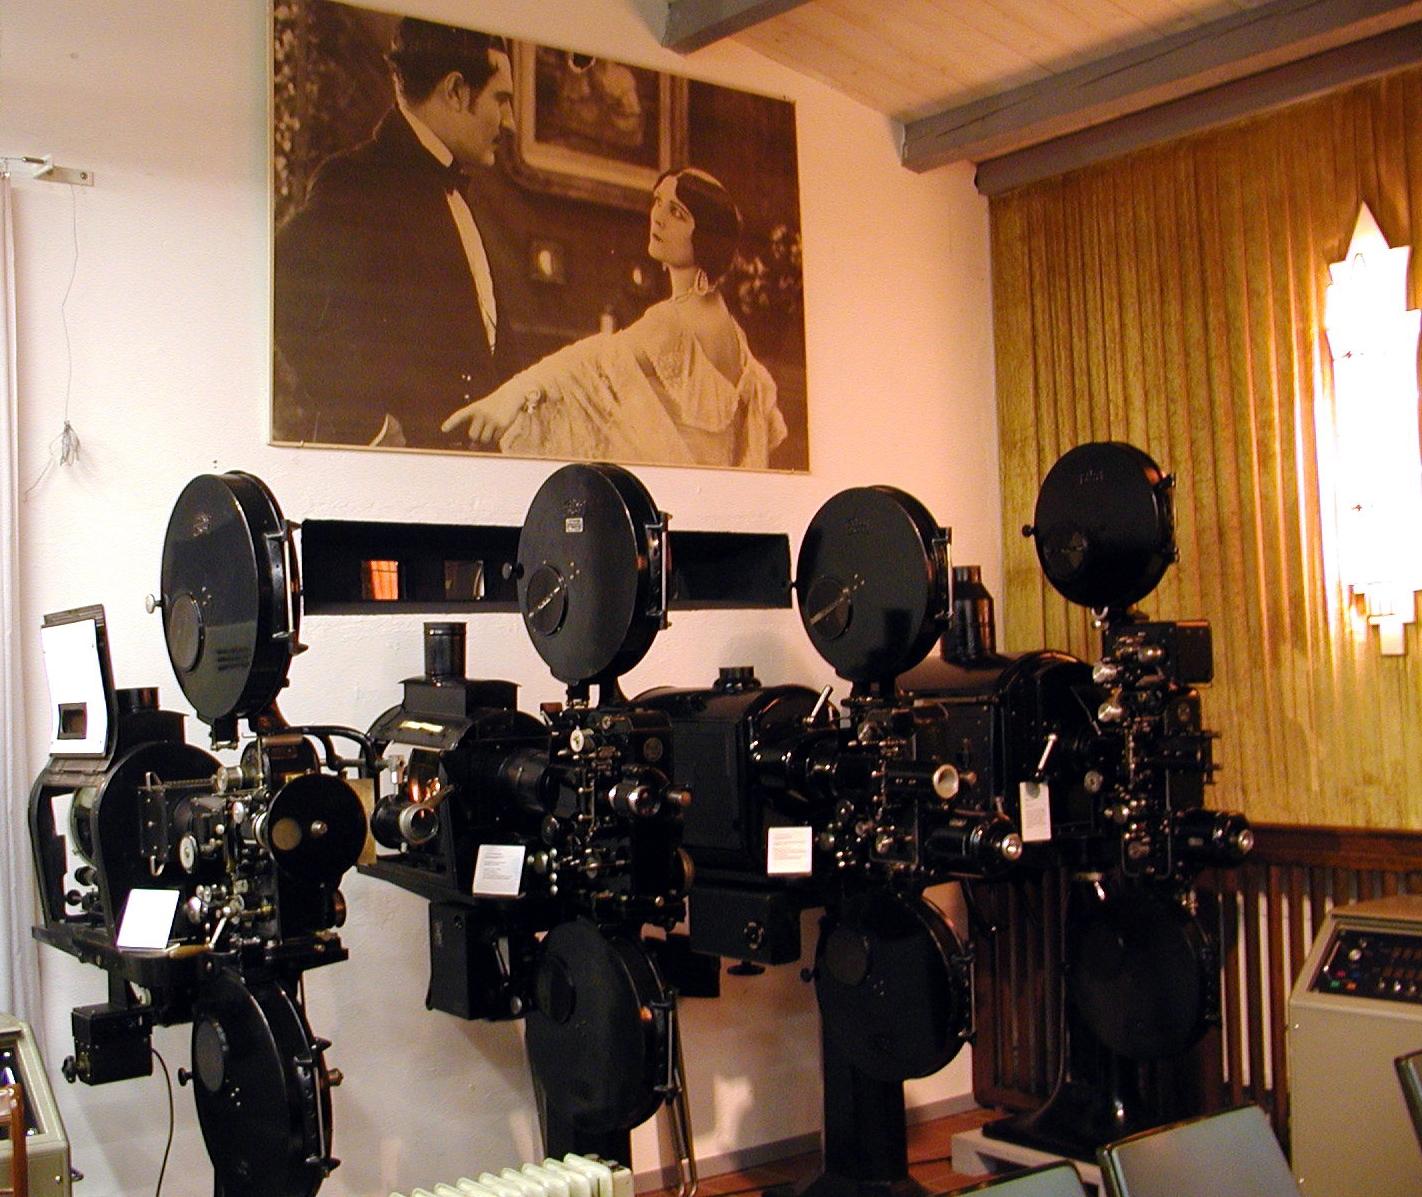 Abspielgeräte im Kinomuseum Vollbüttel